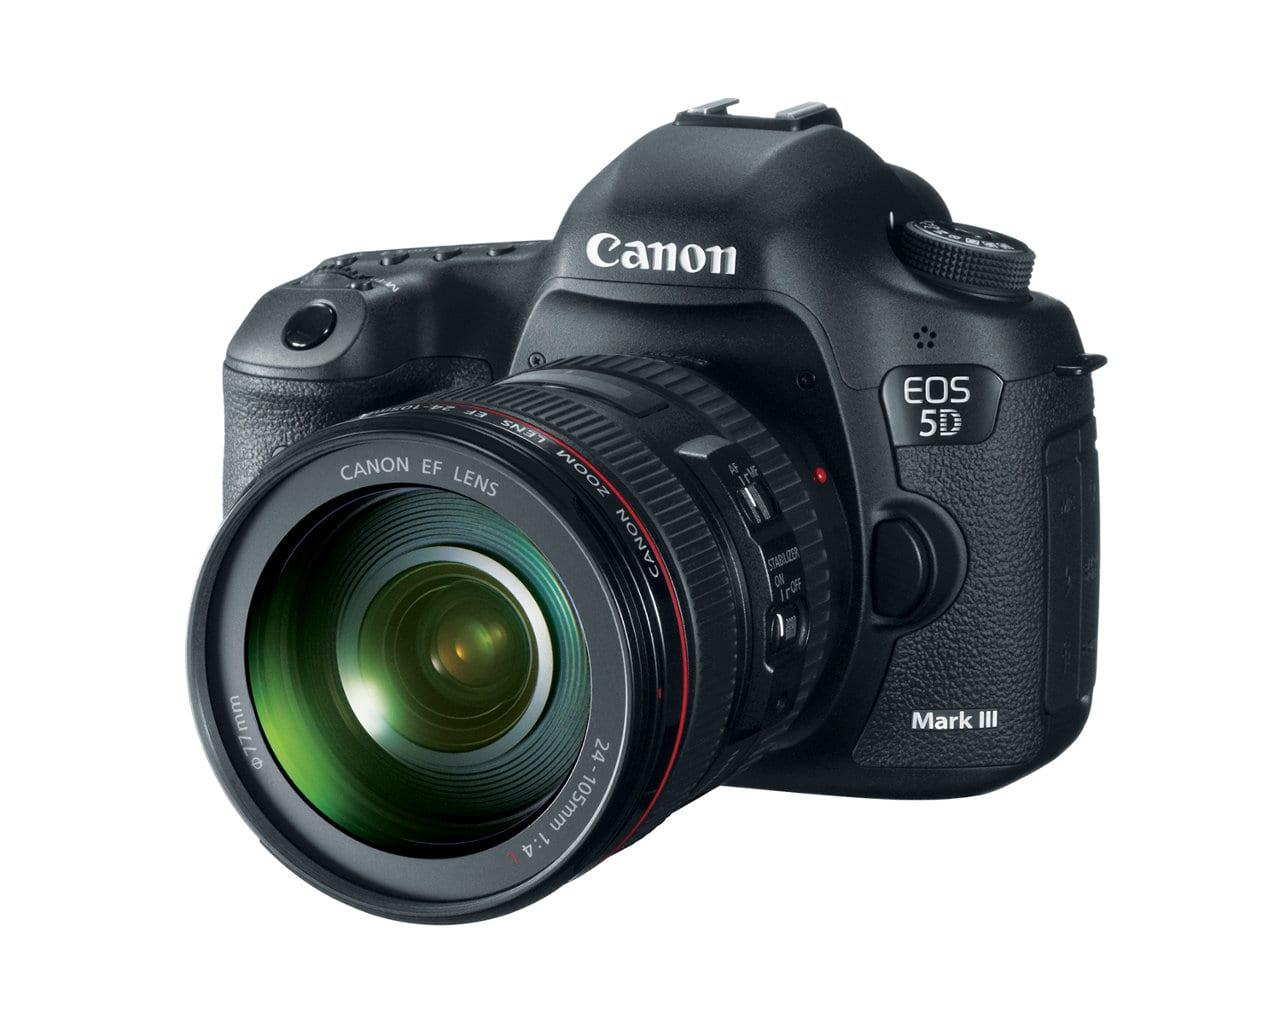 Canon 5D Mark III DSLR camera.